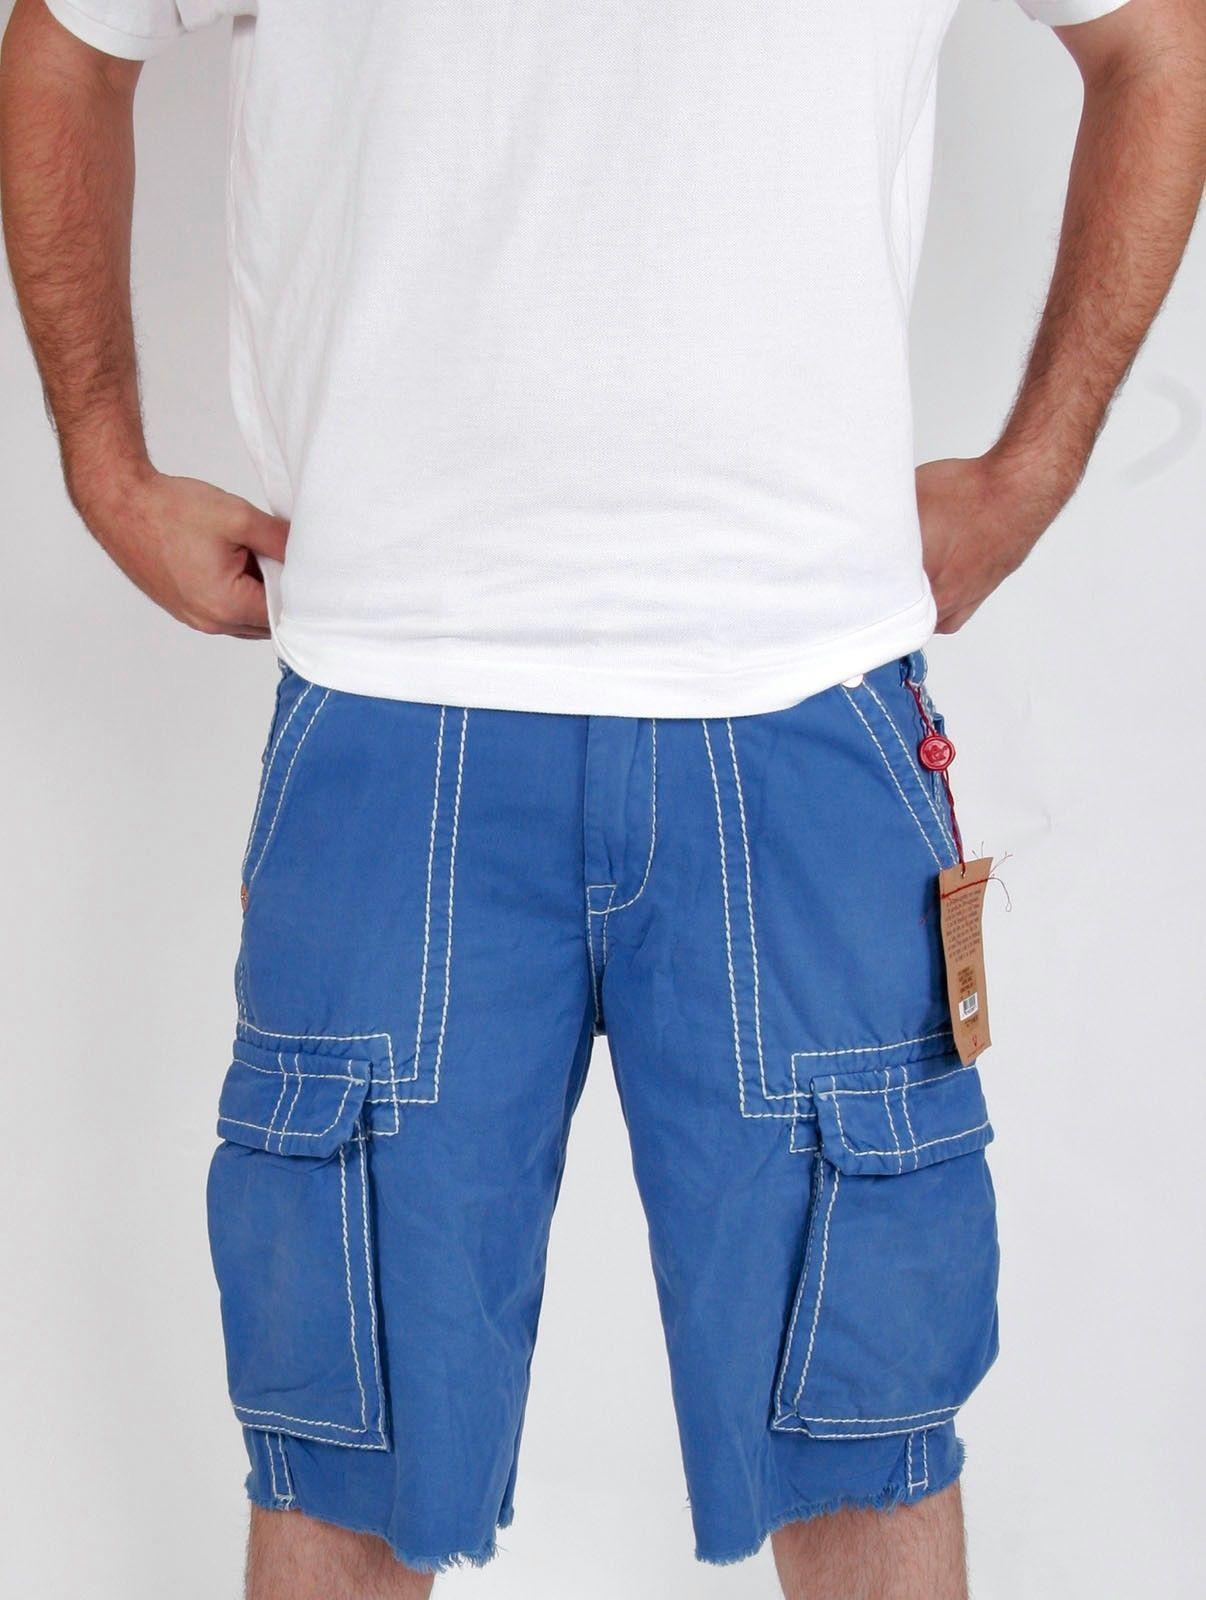 true religion shorts mens sale